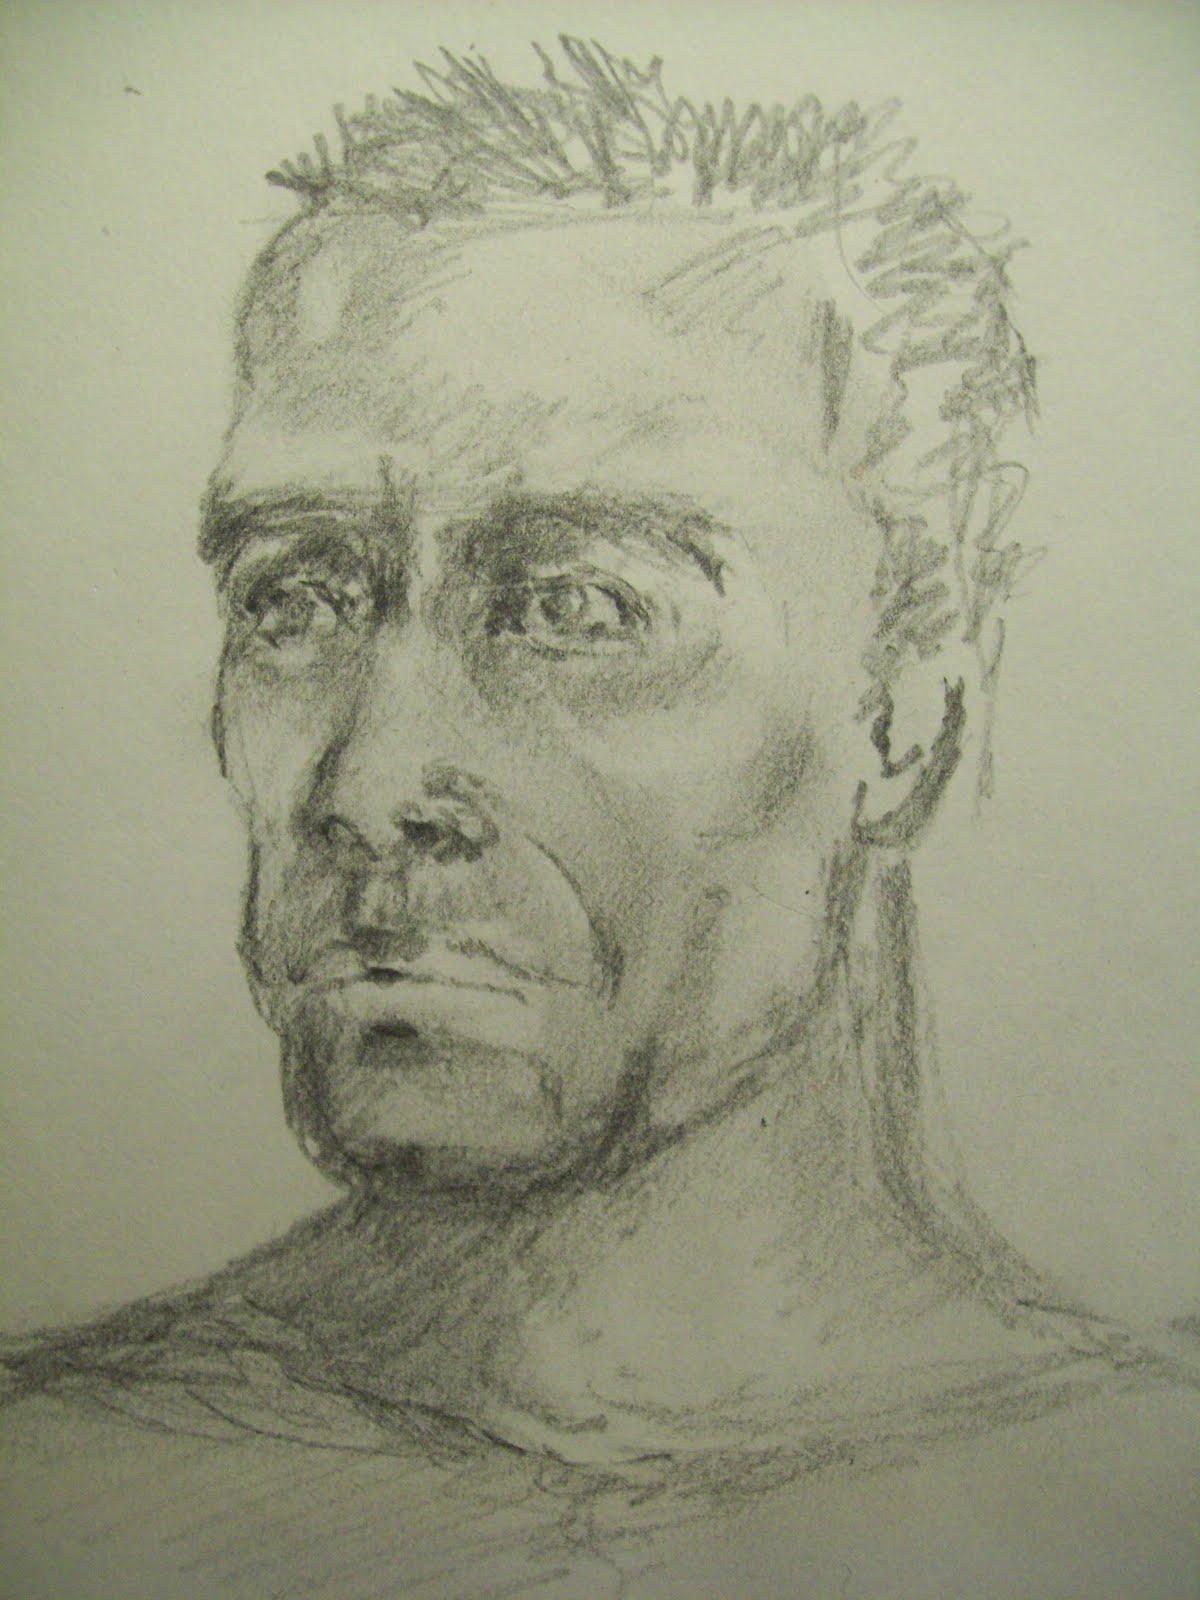 http://4.bp.blogspot.com/-pAtaLuhOqp8/TcsKJHhOFrI/AAAAAAAAANE/52lGDUMXmA8/s1600/Arnold%20Schwartzenegger.JPG